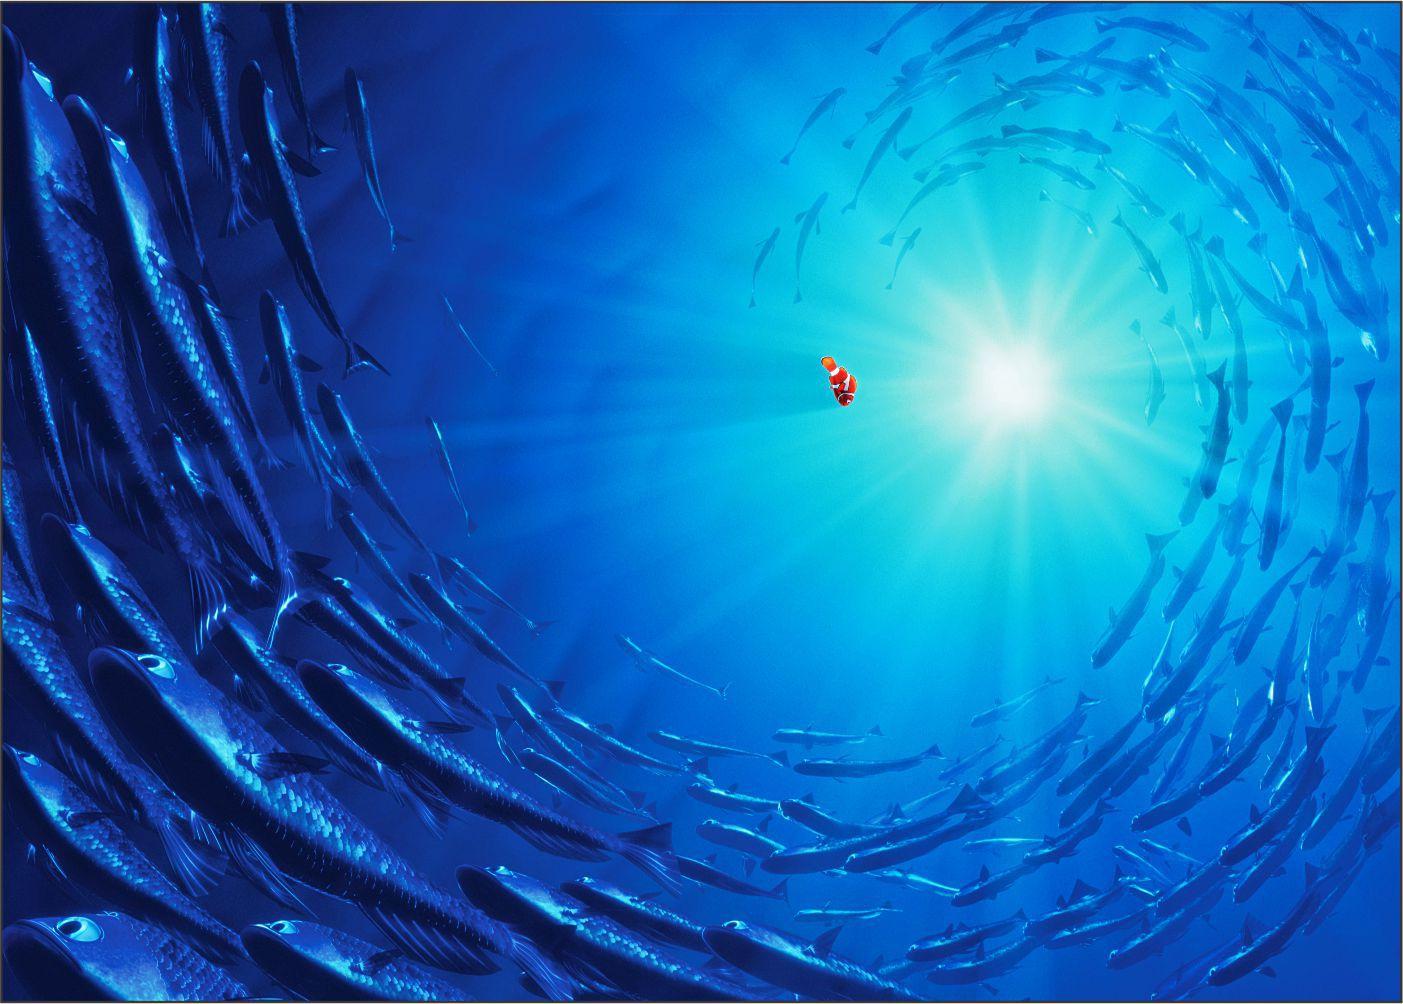 Papel de Parede 3D Nemo 0013 - Adesivos de Parede  - Paredes Decoradas